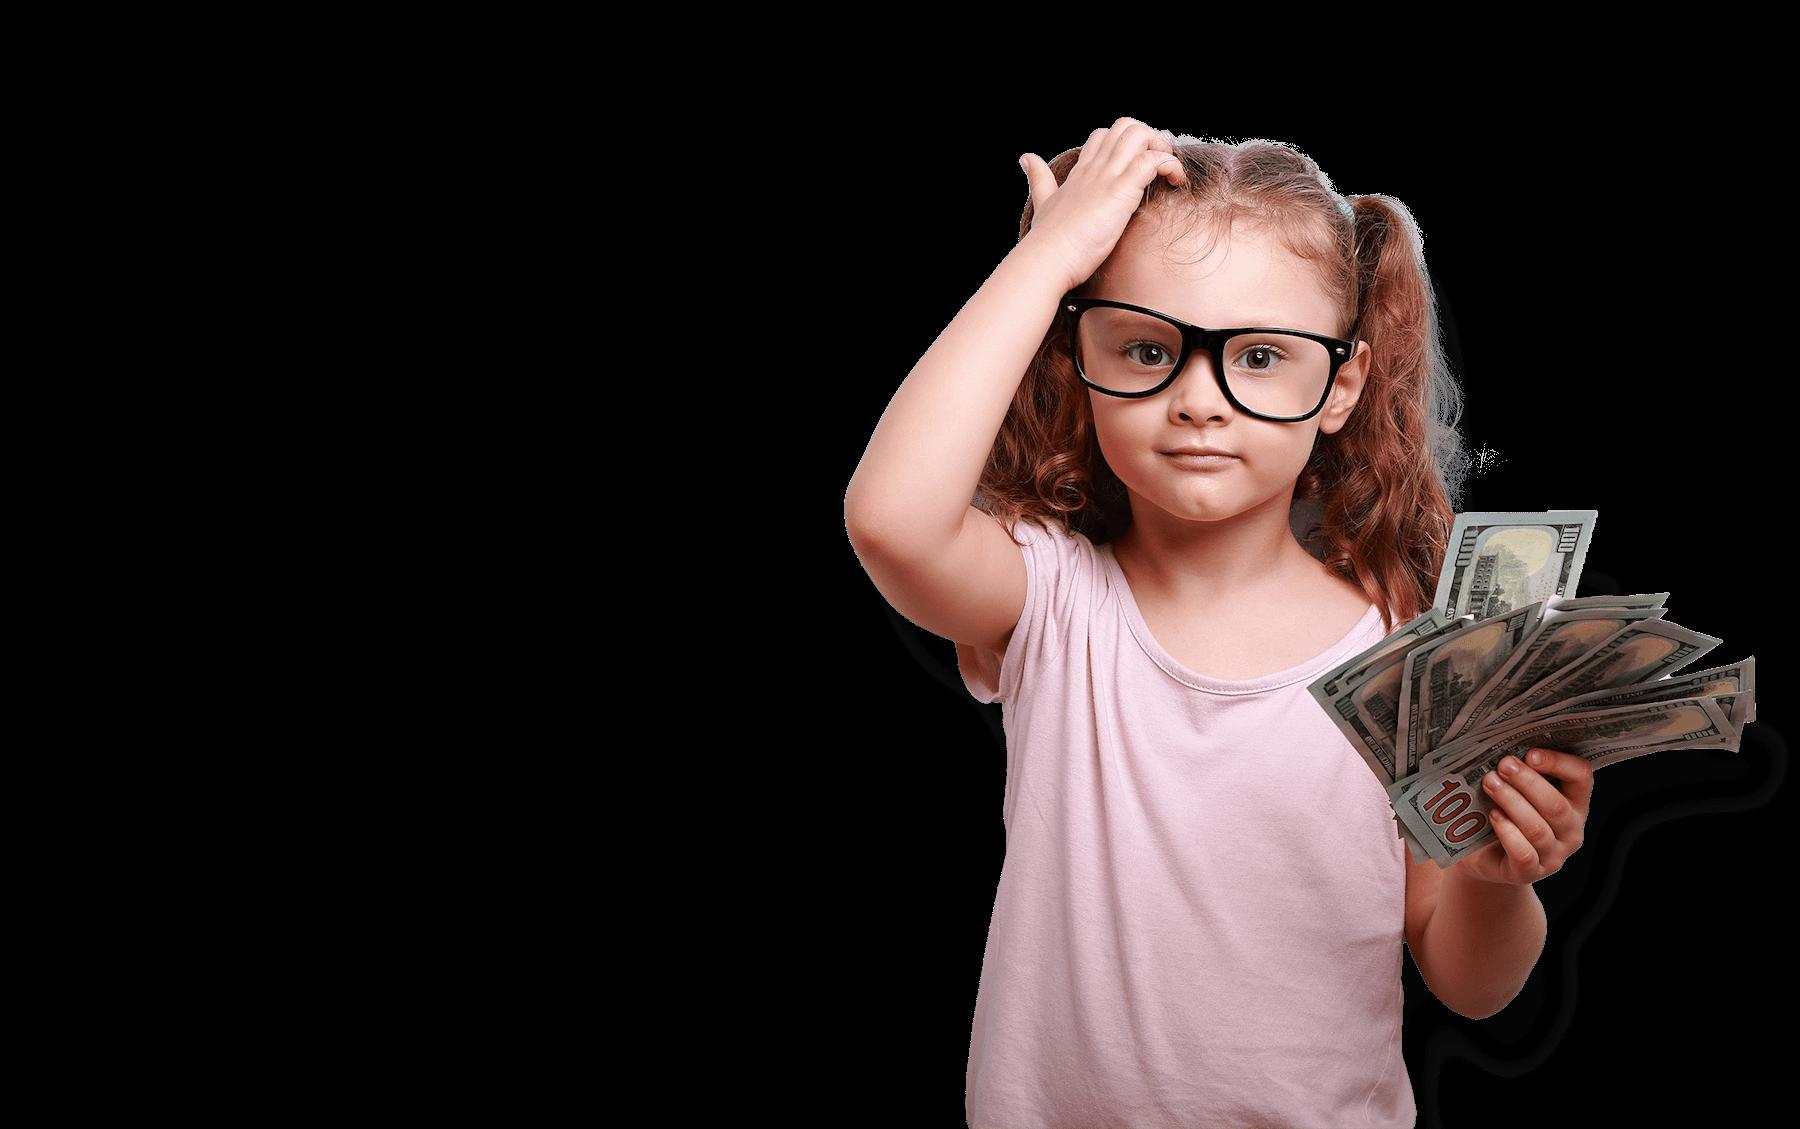 Child Holding Cash